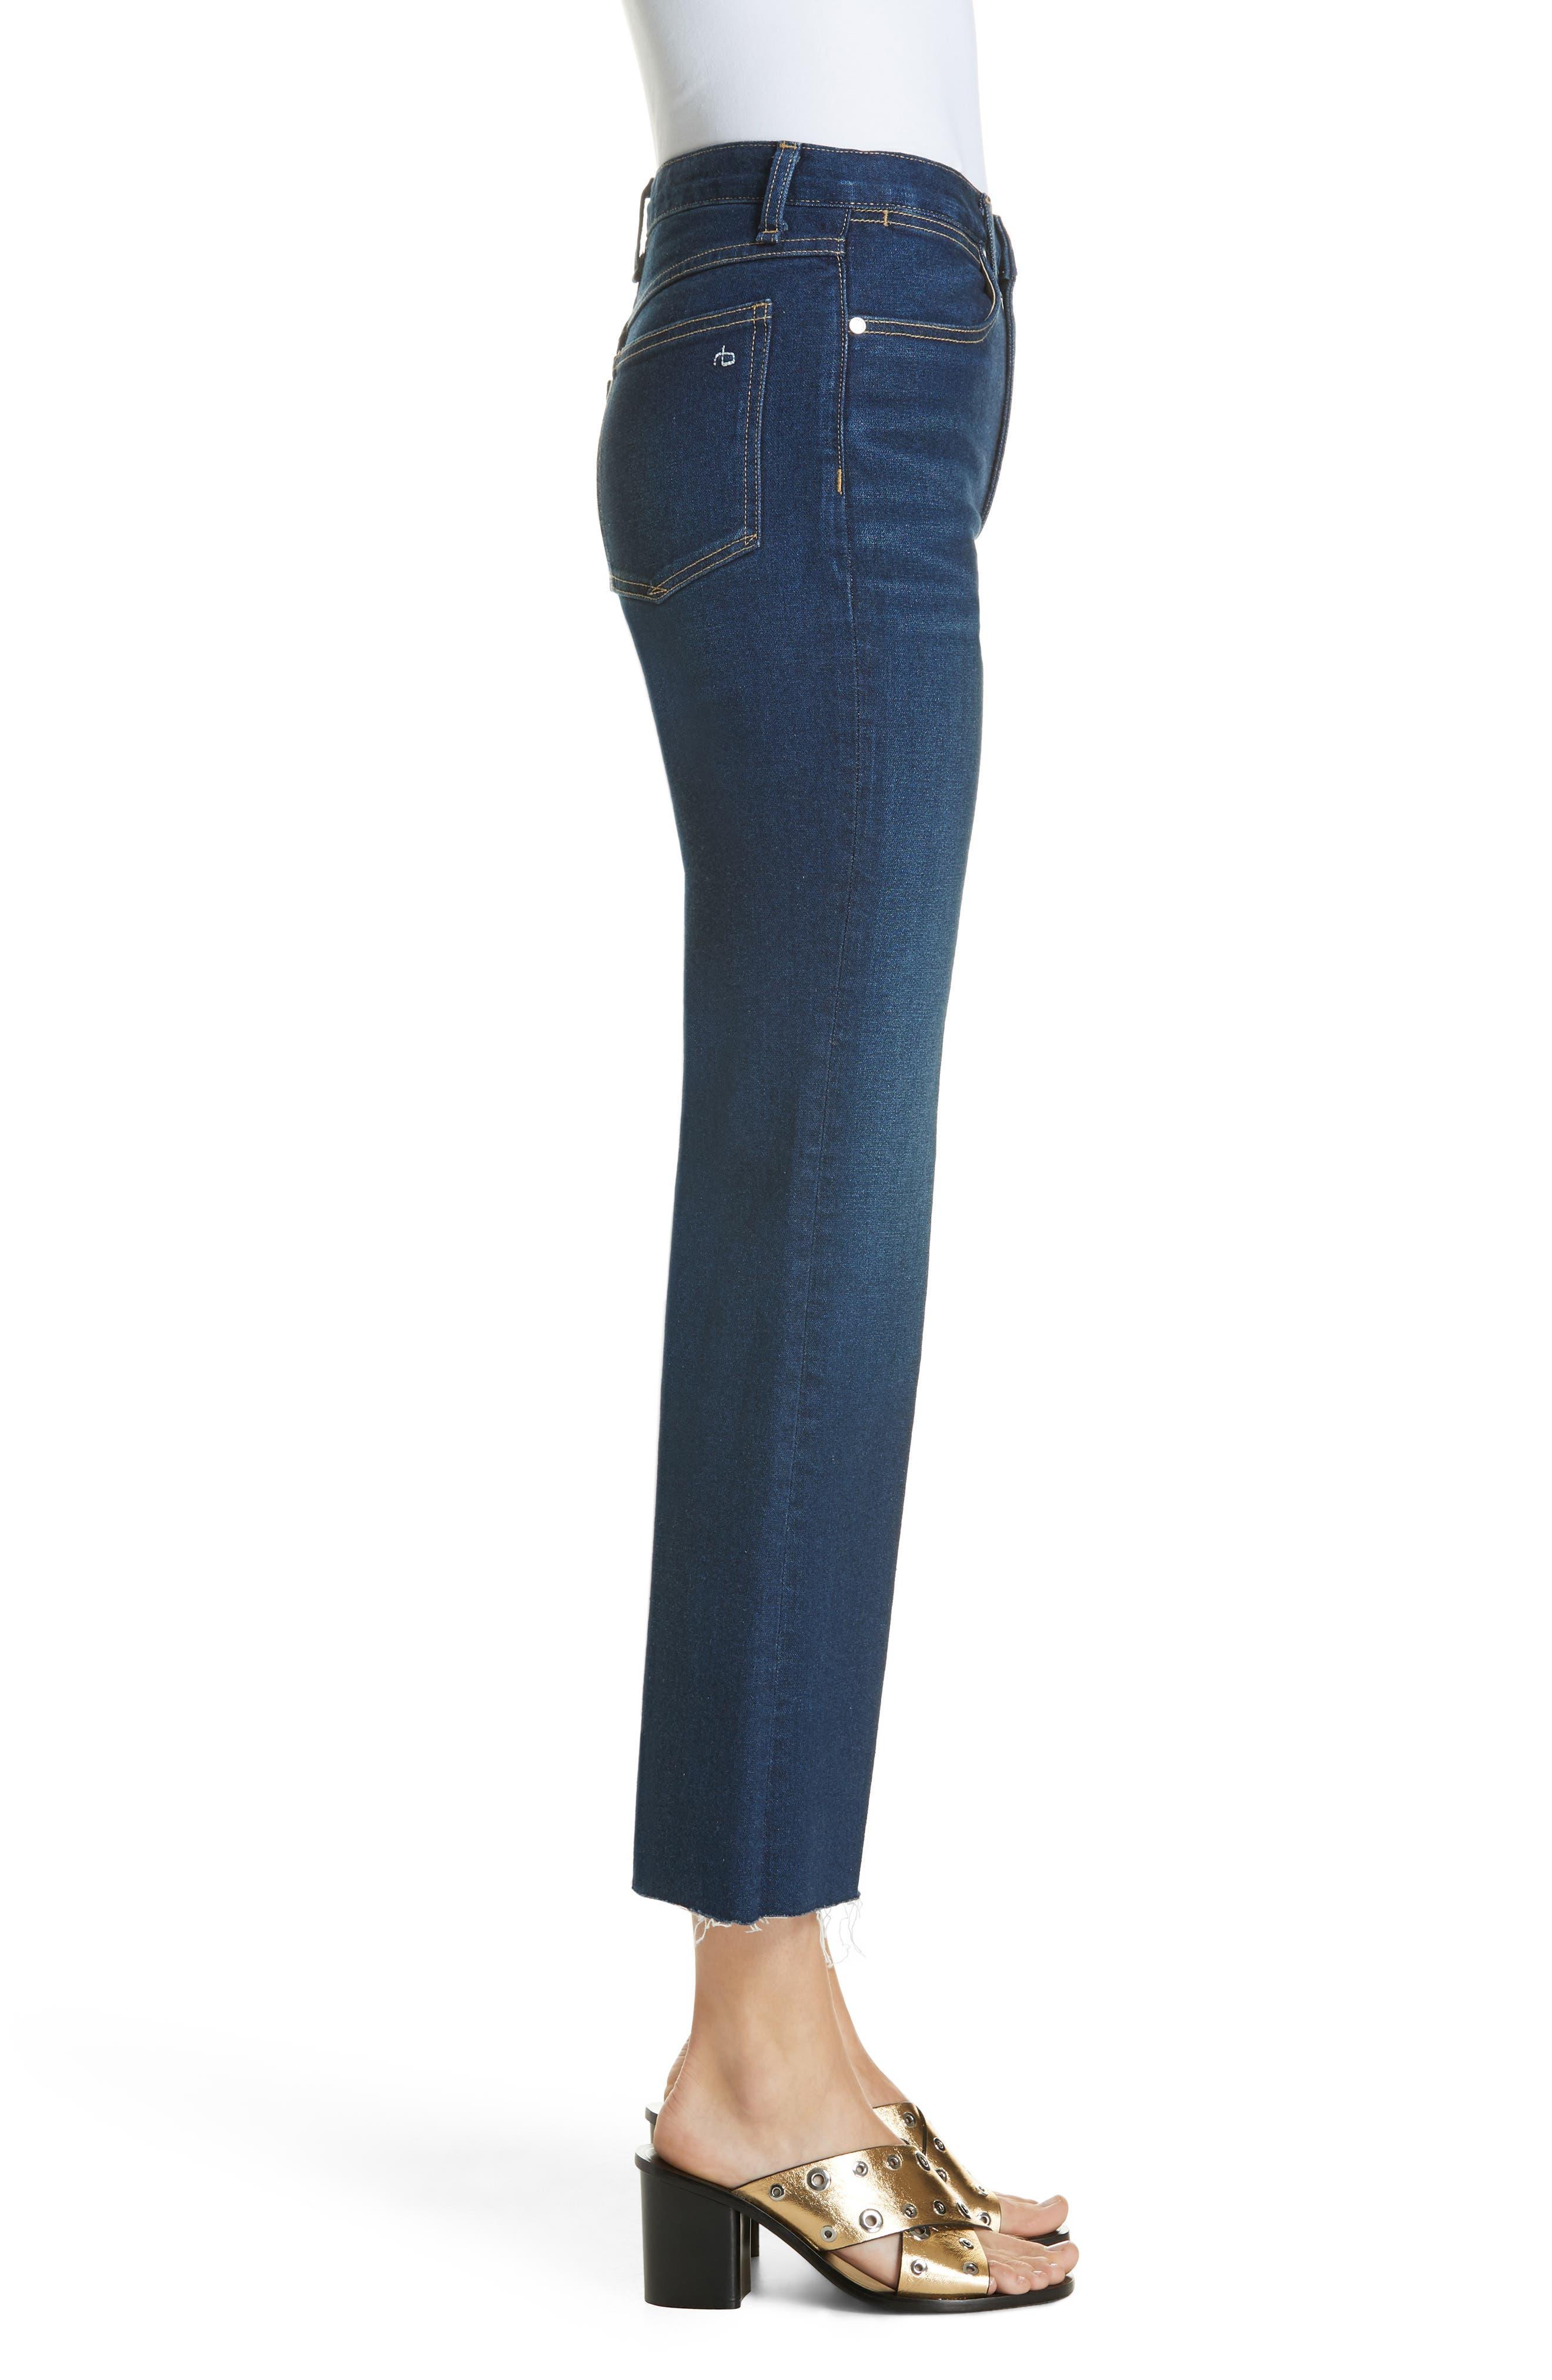 RAG & BONE,                             Justine High Waist Crop Wide Leg Jeans,                             Alternate thumbnail 3, color,                             410